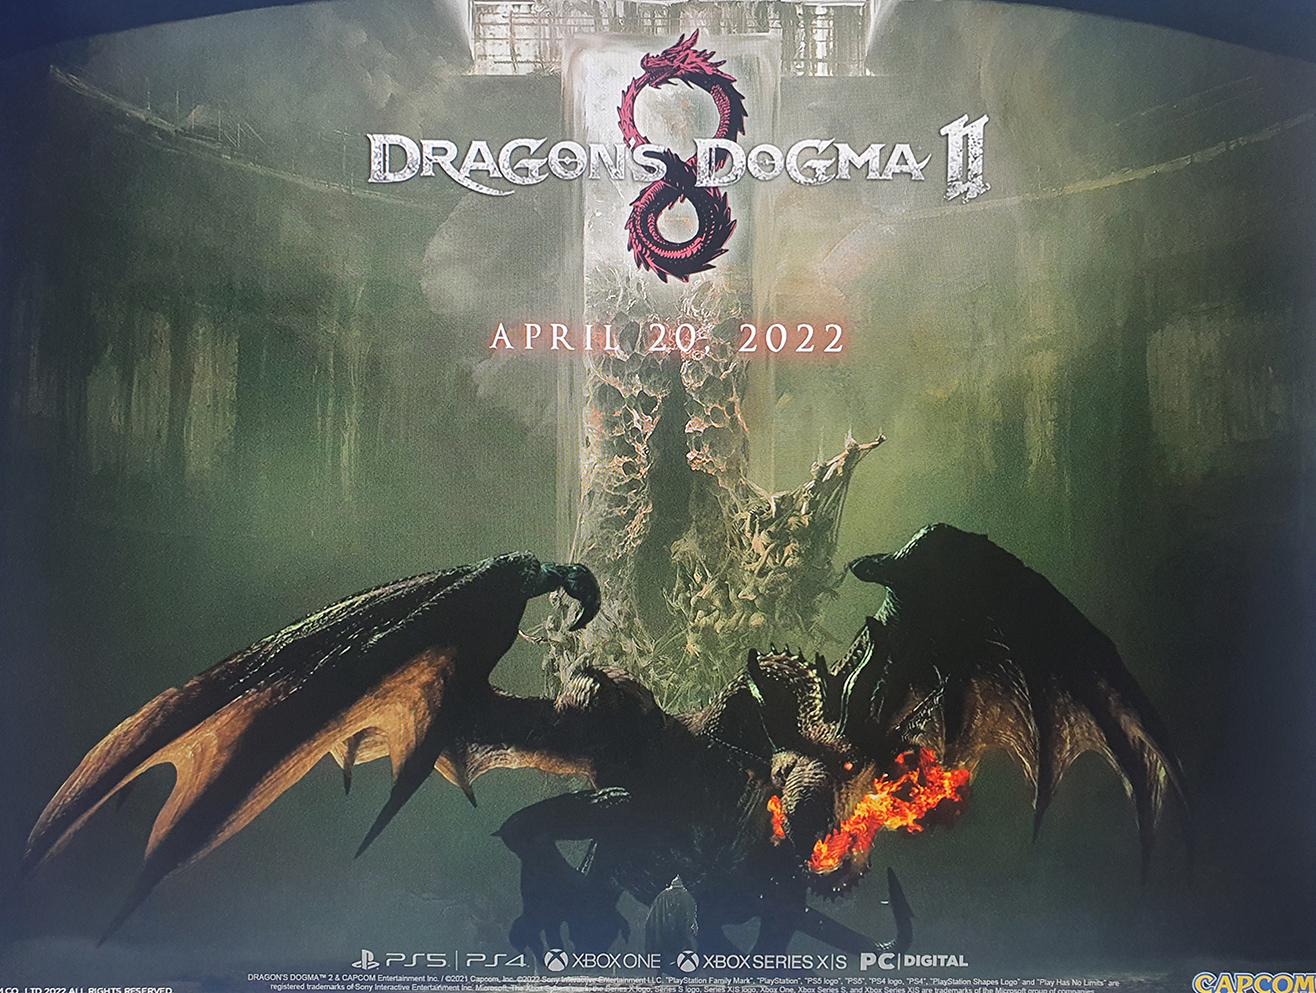 Dragon's Dogma II